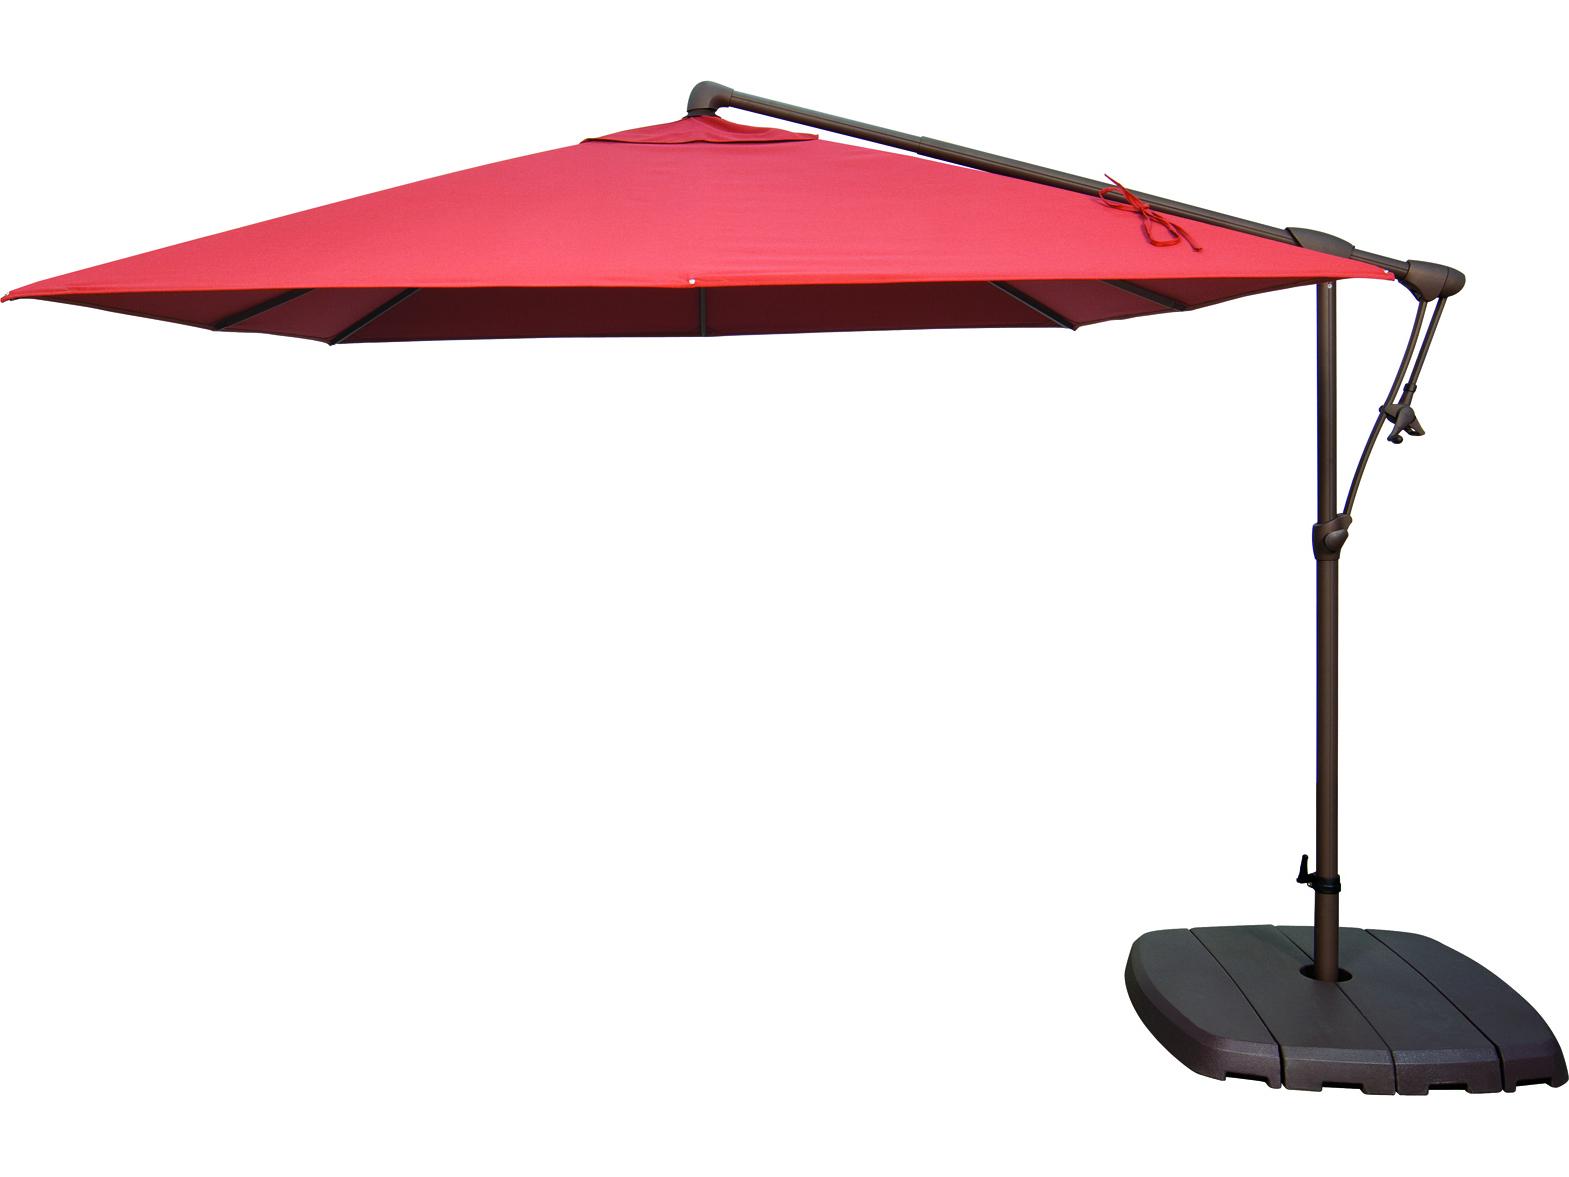 Krystal Square Cantilever Sunbrella Umbrellas For Trendy Treasure Garden Cantilever Ag19Sq Aluminum 8.5 Foot Wide Square Cantilever  Umbrella (Gallery 9 of 20)